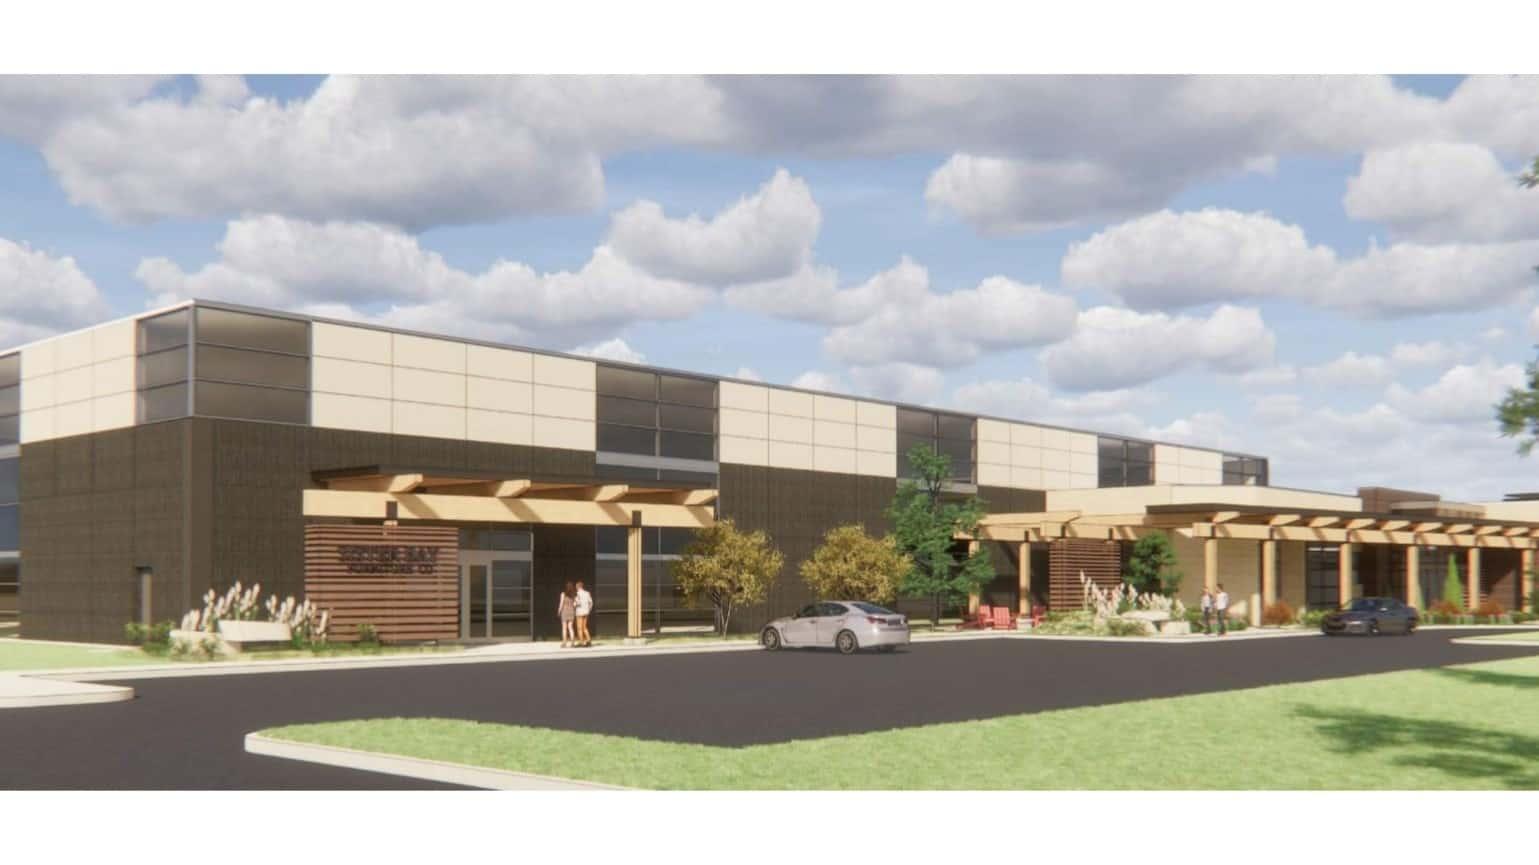 Rendering: Zimmerman Architectural Studios Inc.